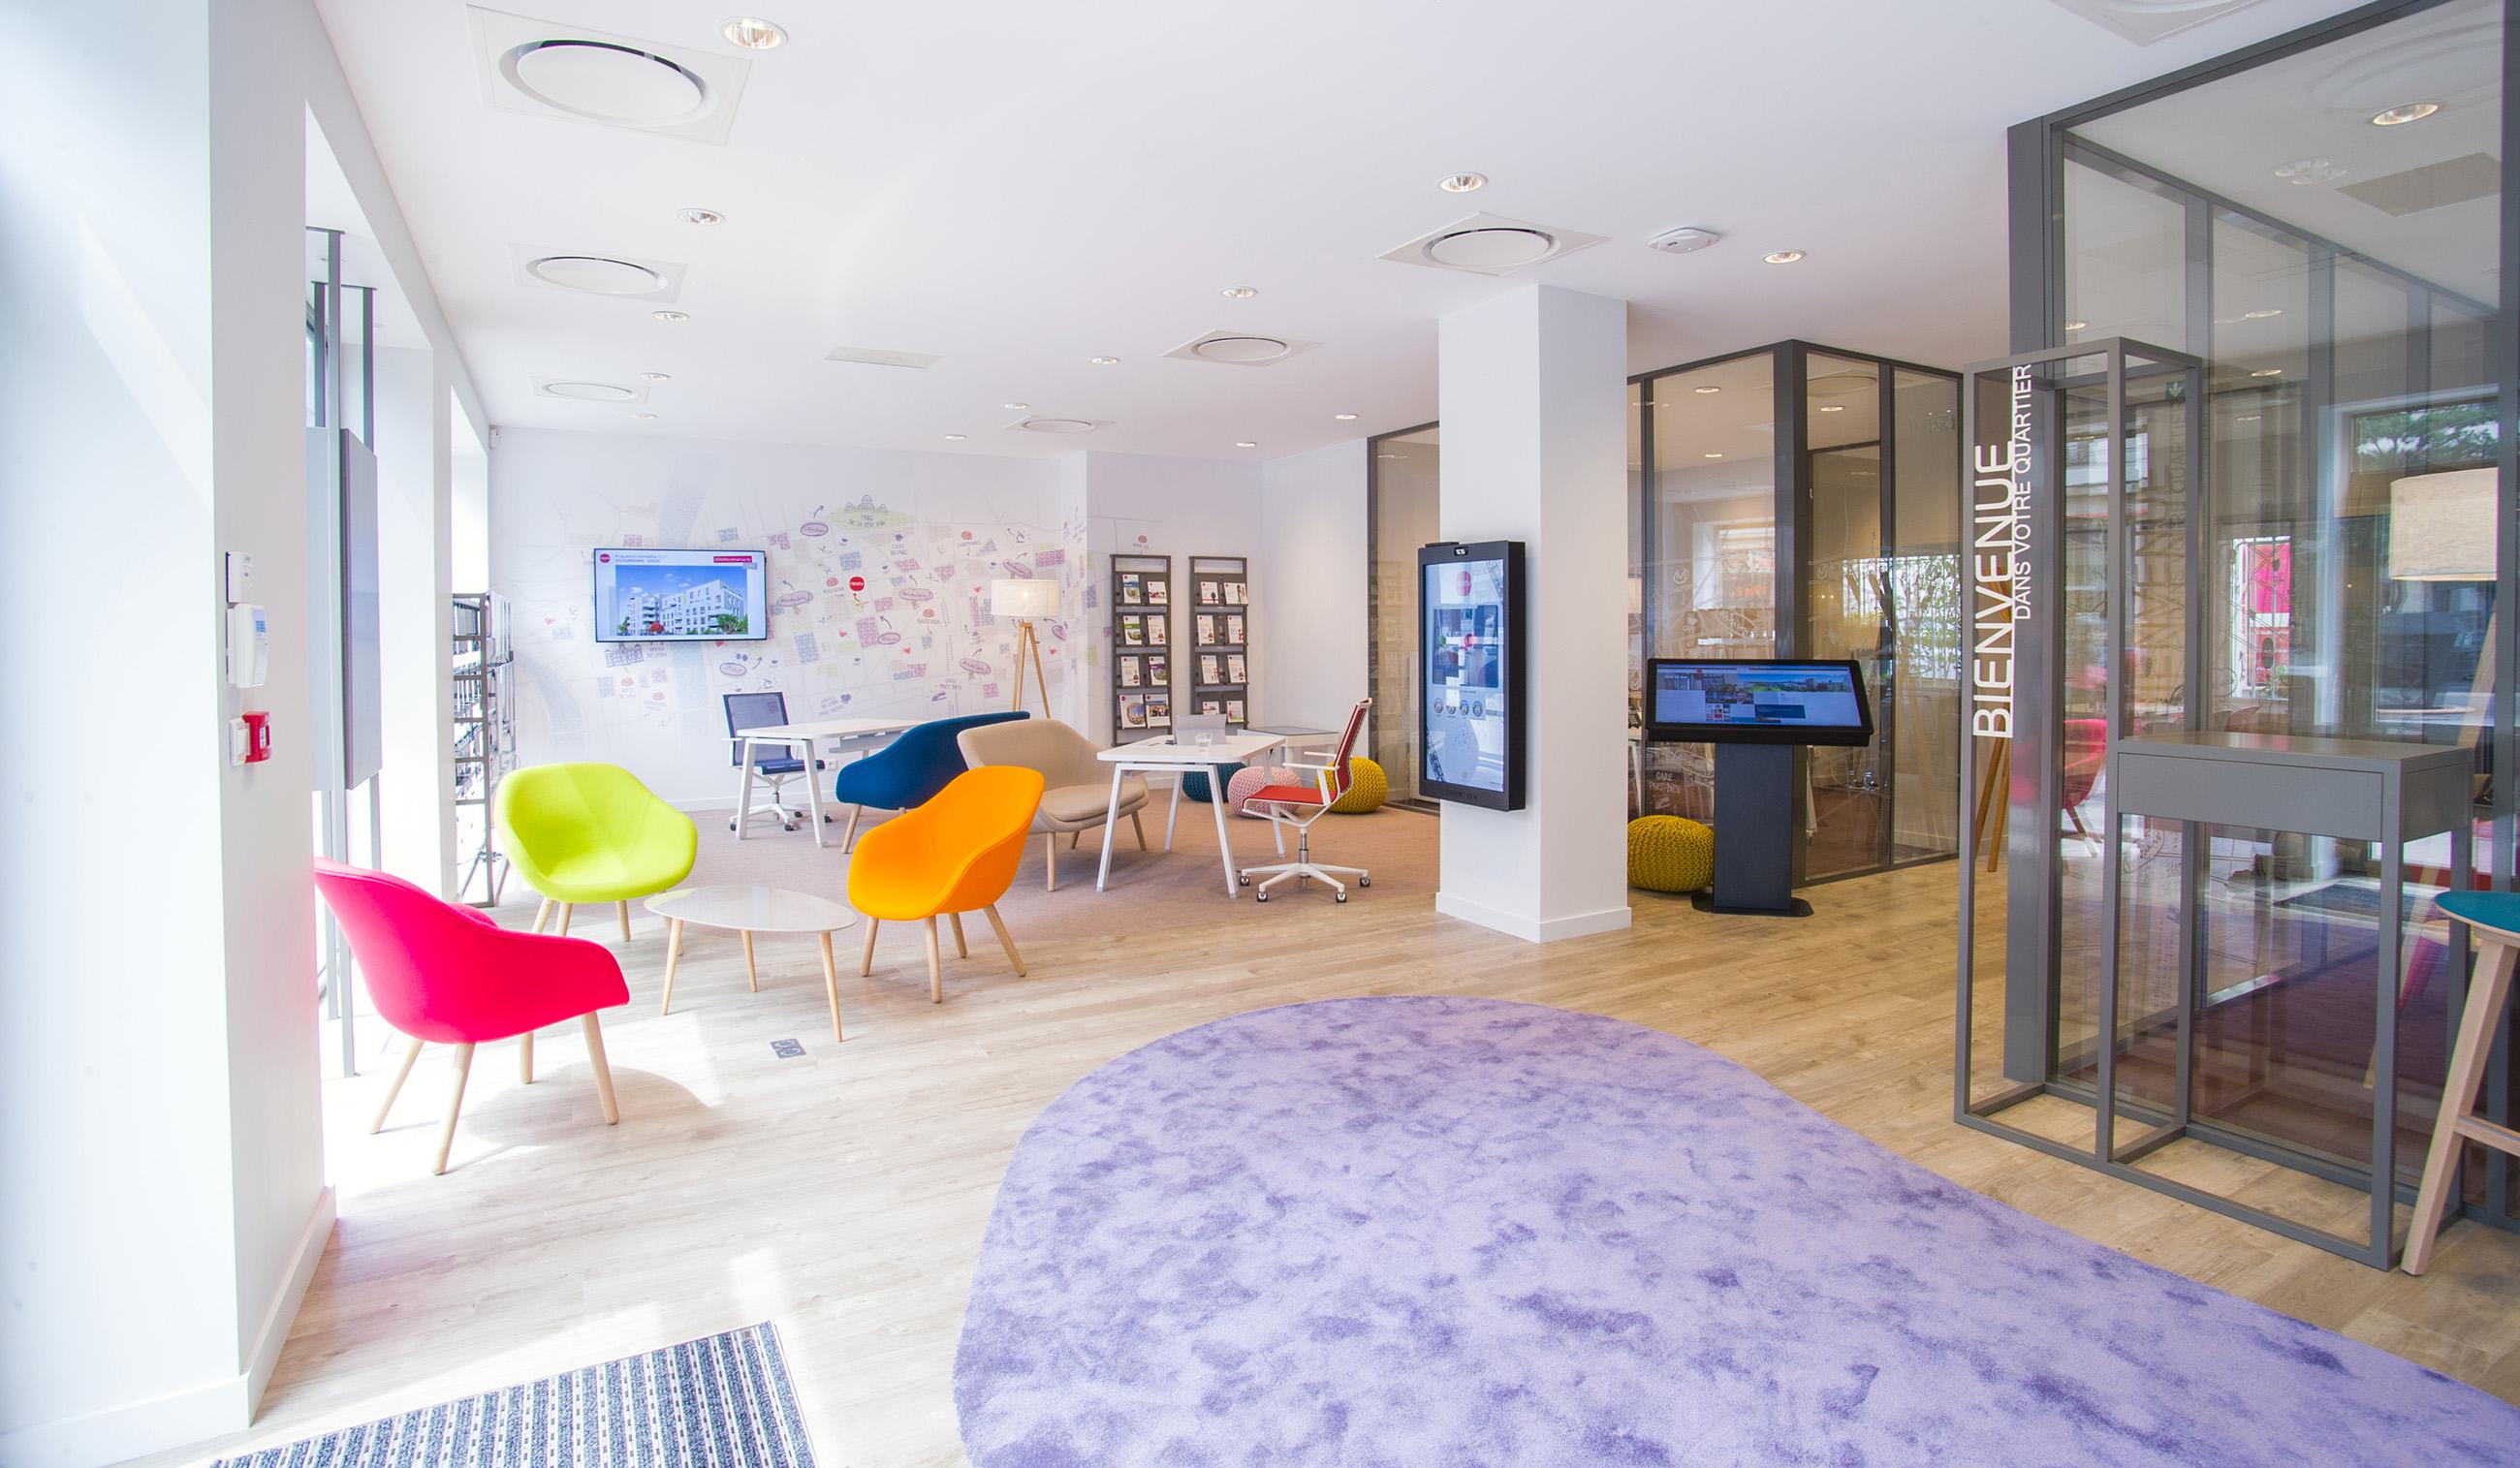 nexity ouvre sa premi re agence connect e lyon cours vitton. Black Bedroom Furniture Sets. Home Design Ideas